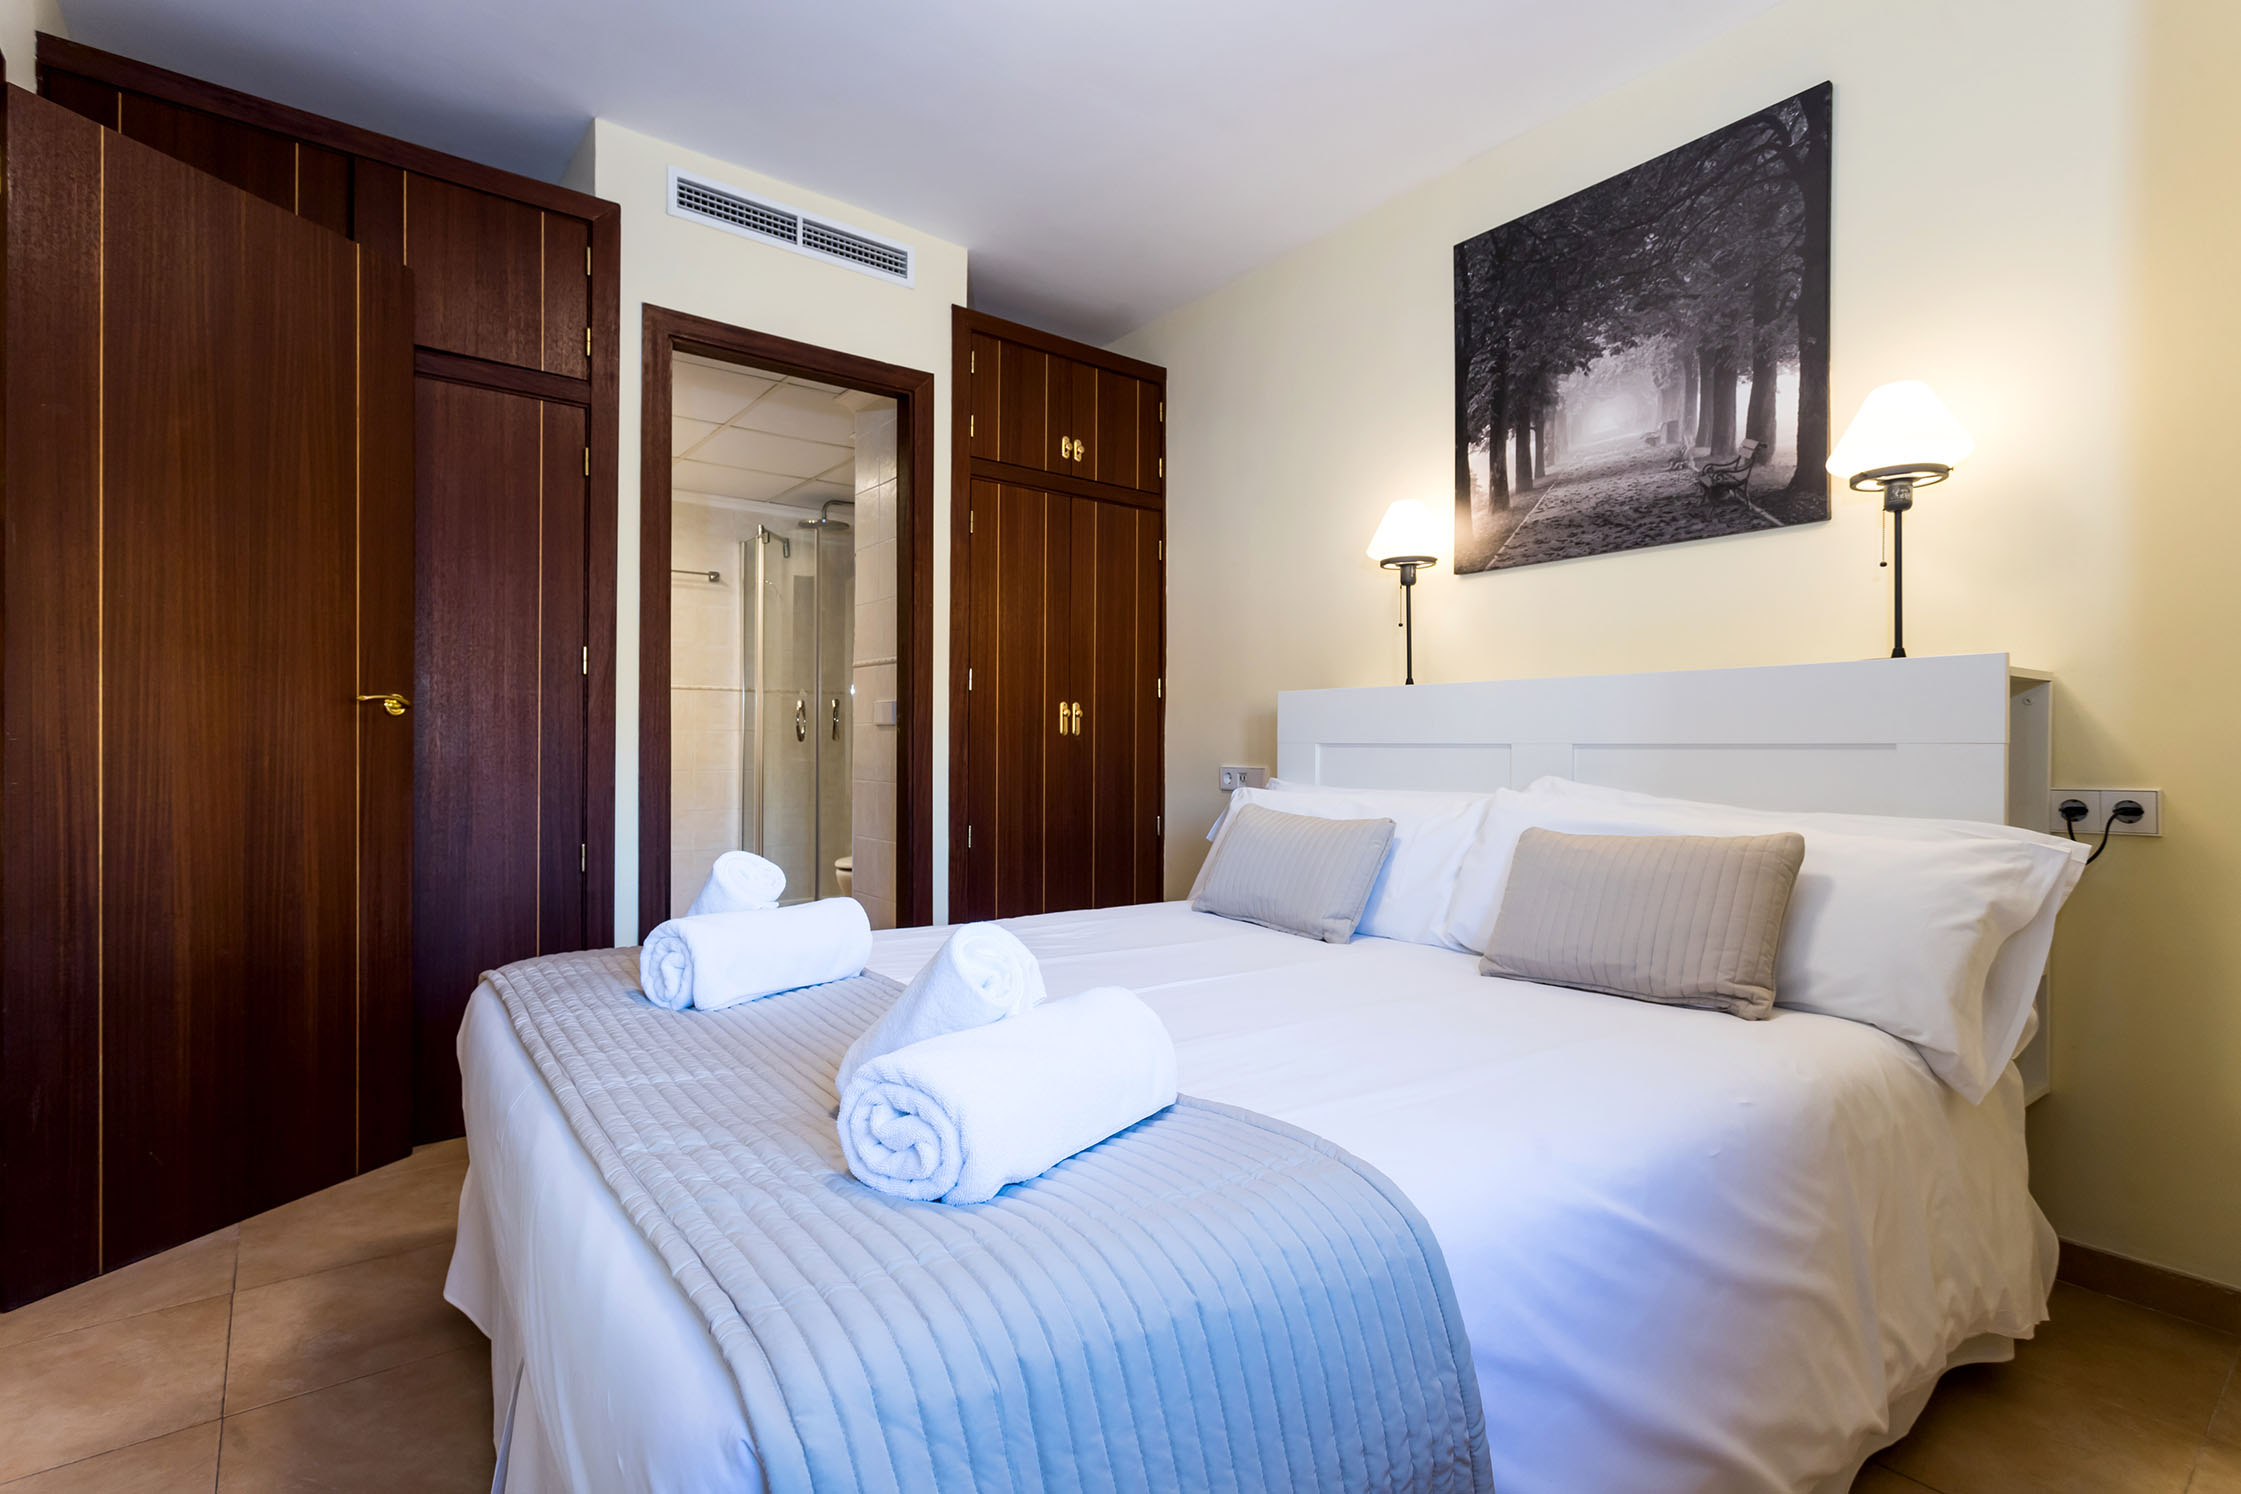 Borne-Suites-Apartamento-Palma-de-Mallorca-Habitación-1